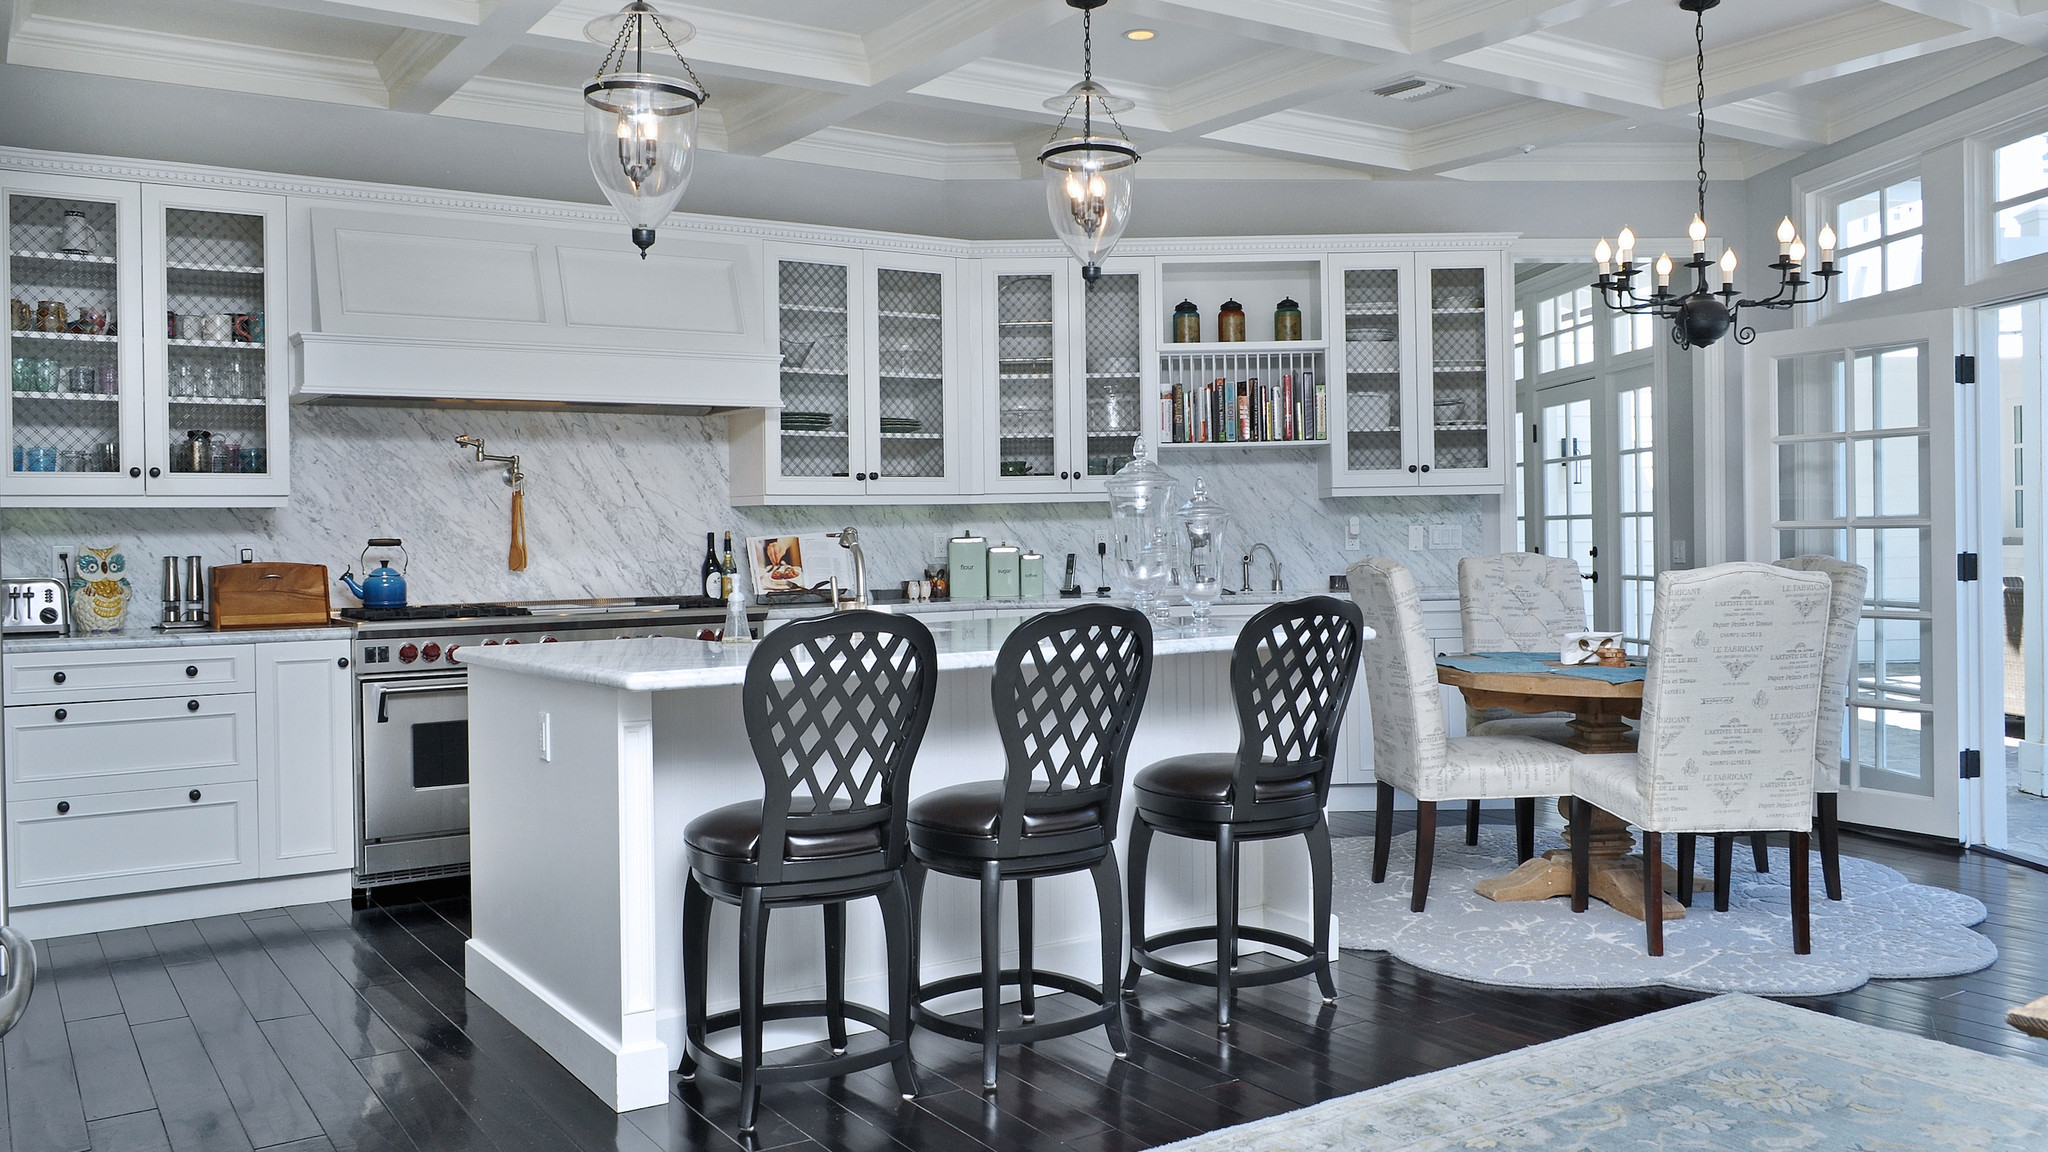 Hot Property | Nick Young - Orlando Sentinel